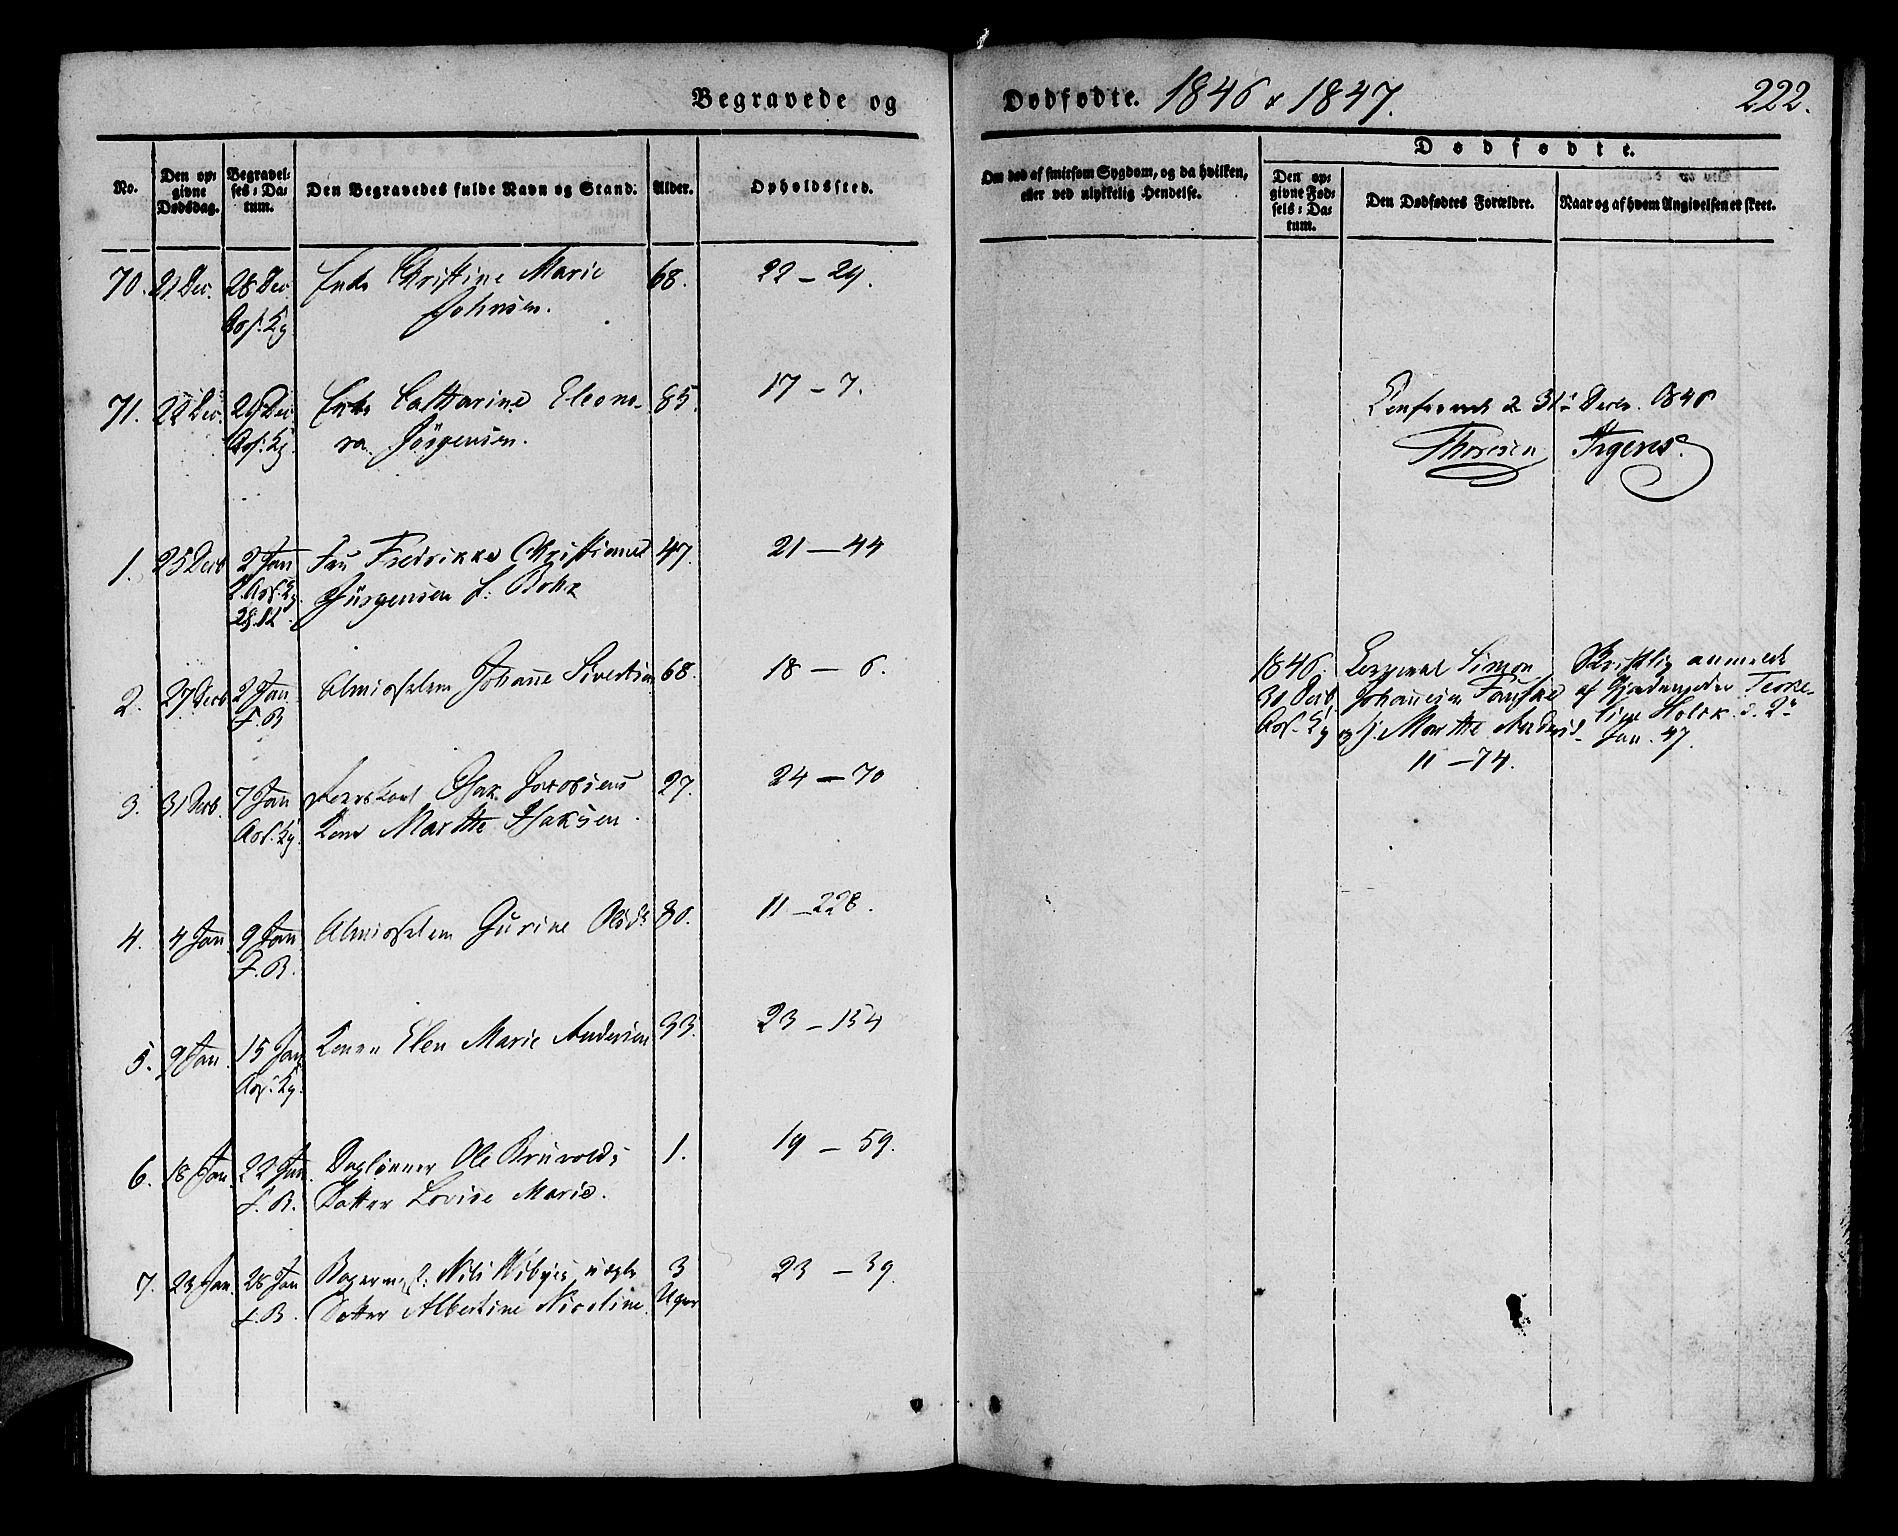 SAB, Korskirken Sokneprestembete, H/Haa/L0043: Ministerialbok nr. E 1, 1834-1848, s. 222